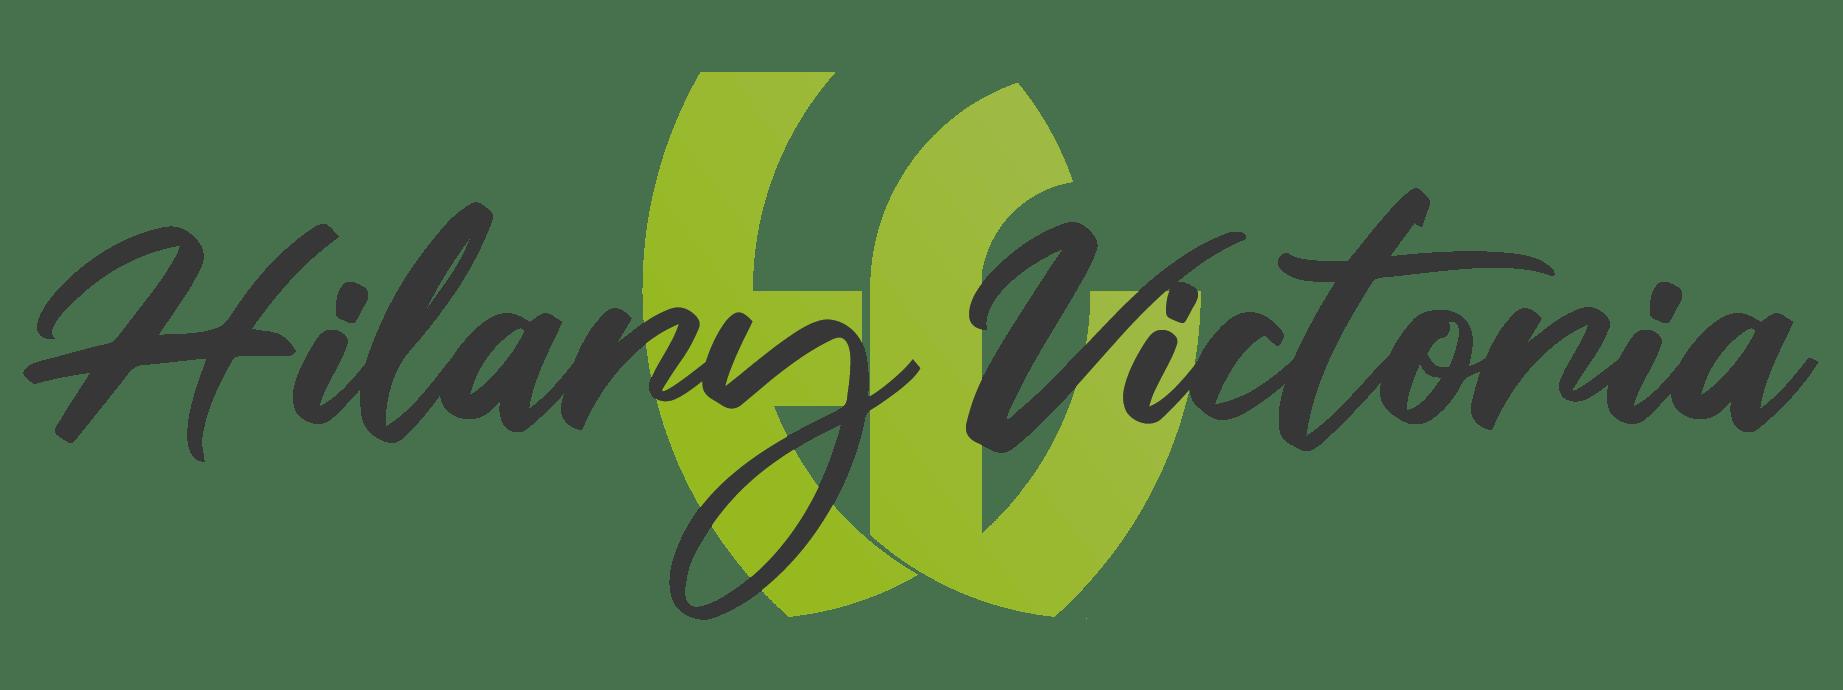 Hilary Victoria Logo